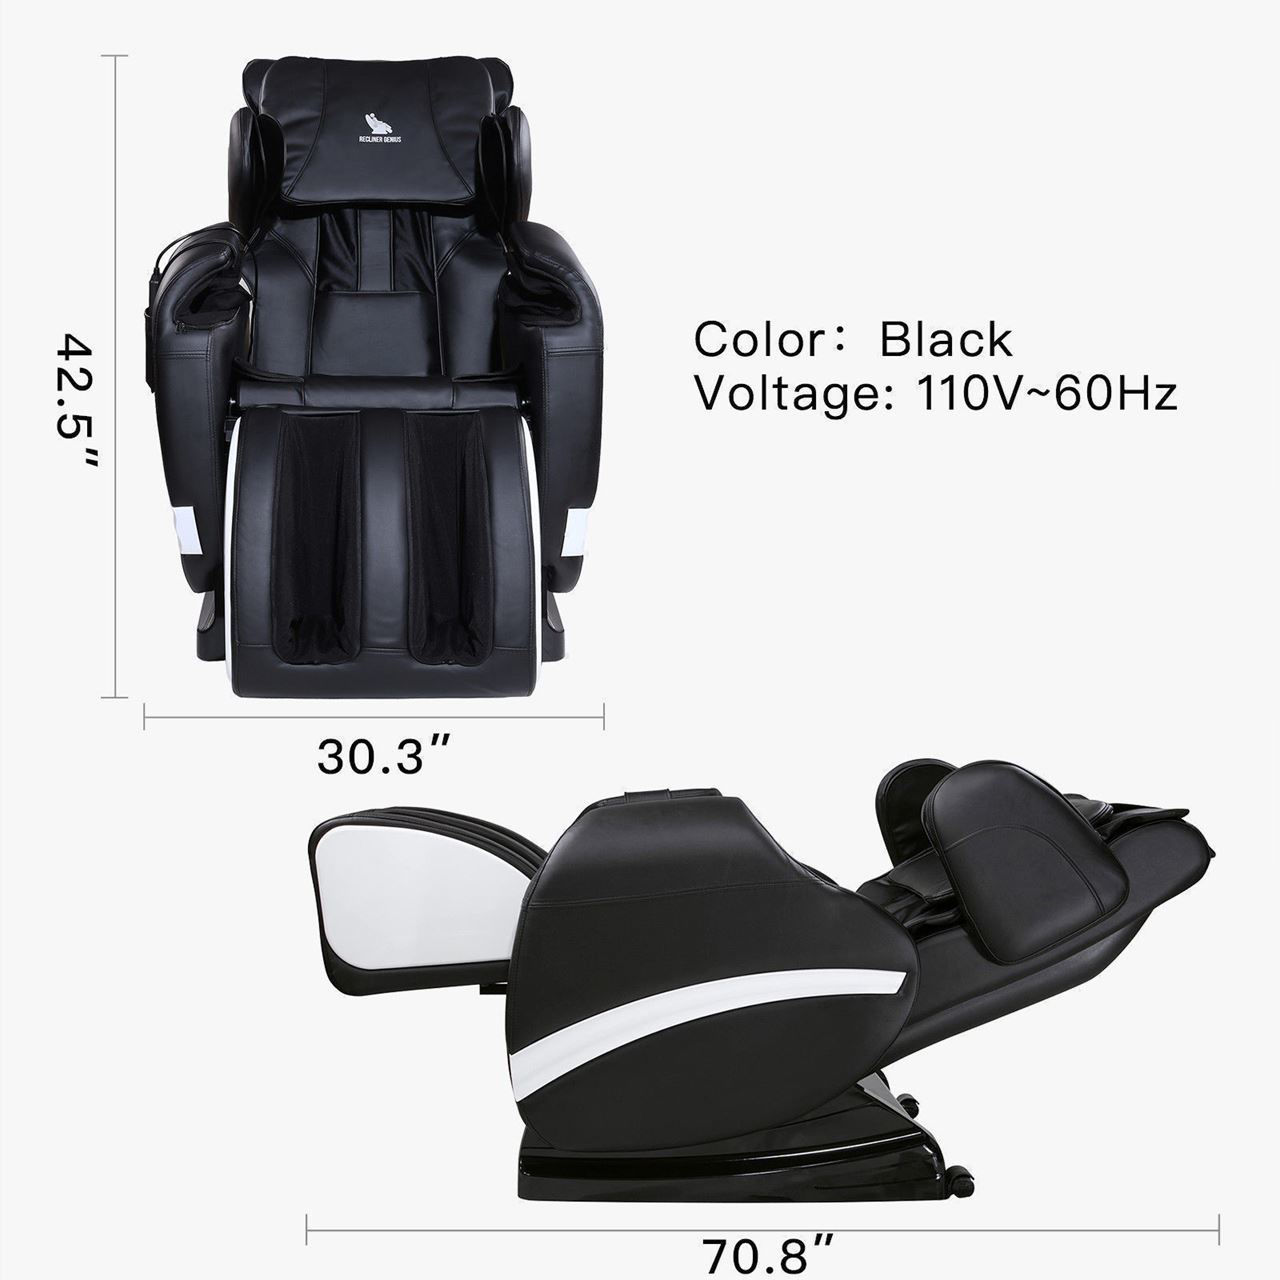 Picture of Full body Shiatsu Recliner Massage Chair with Heat - Black